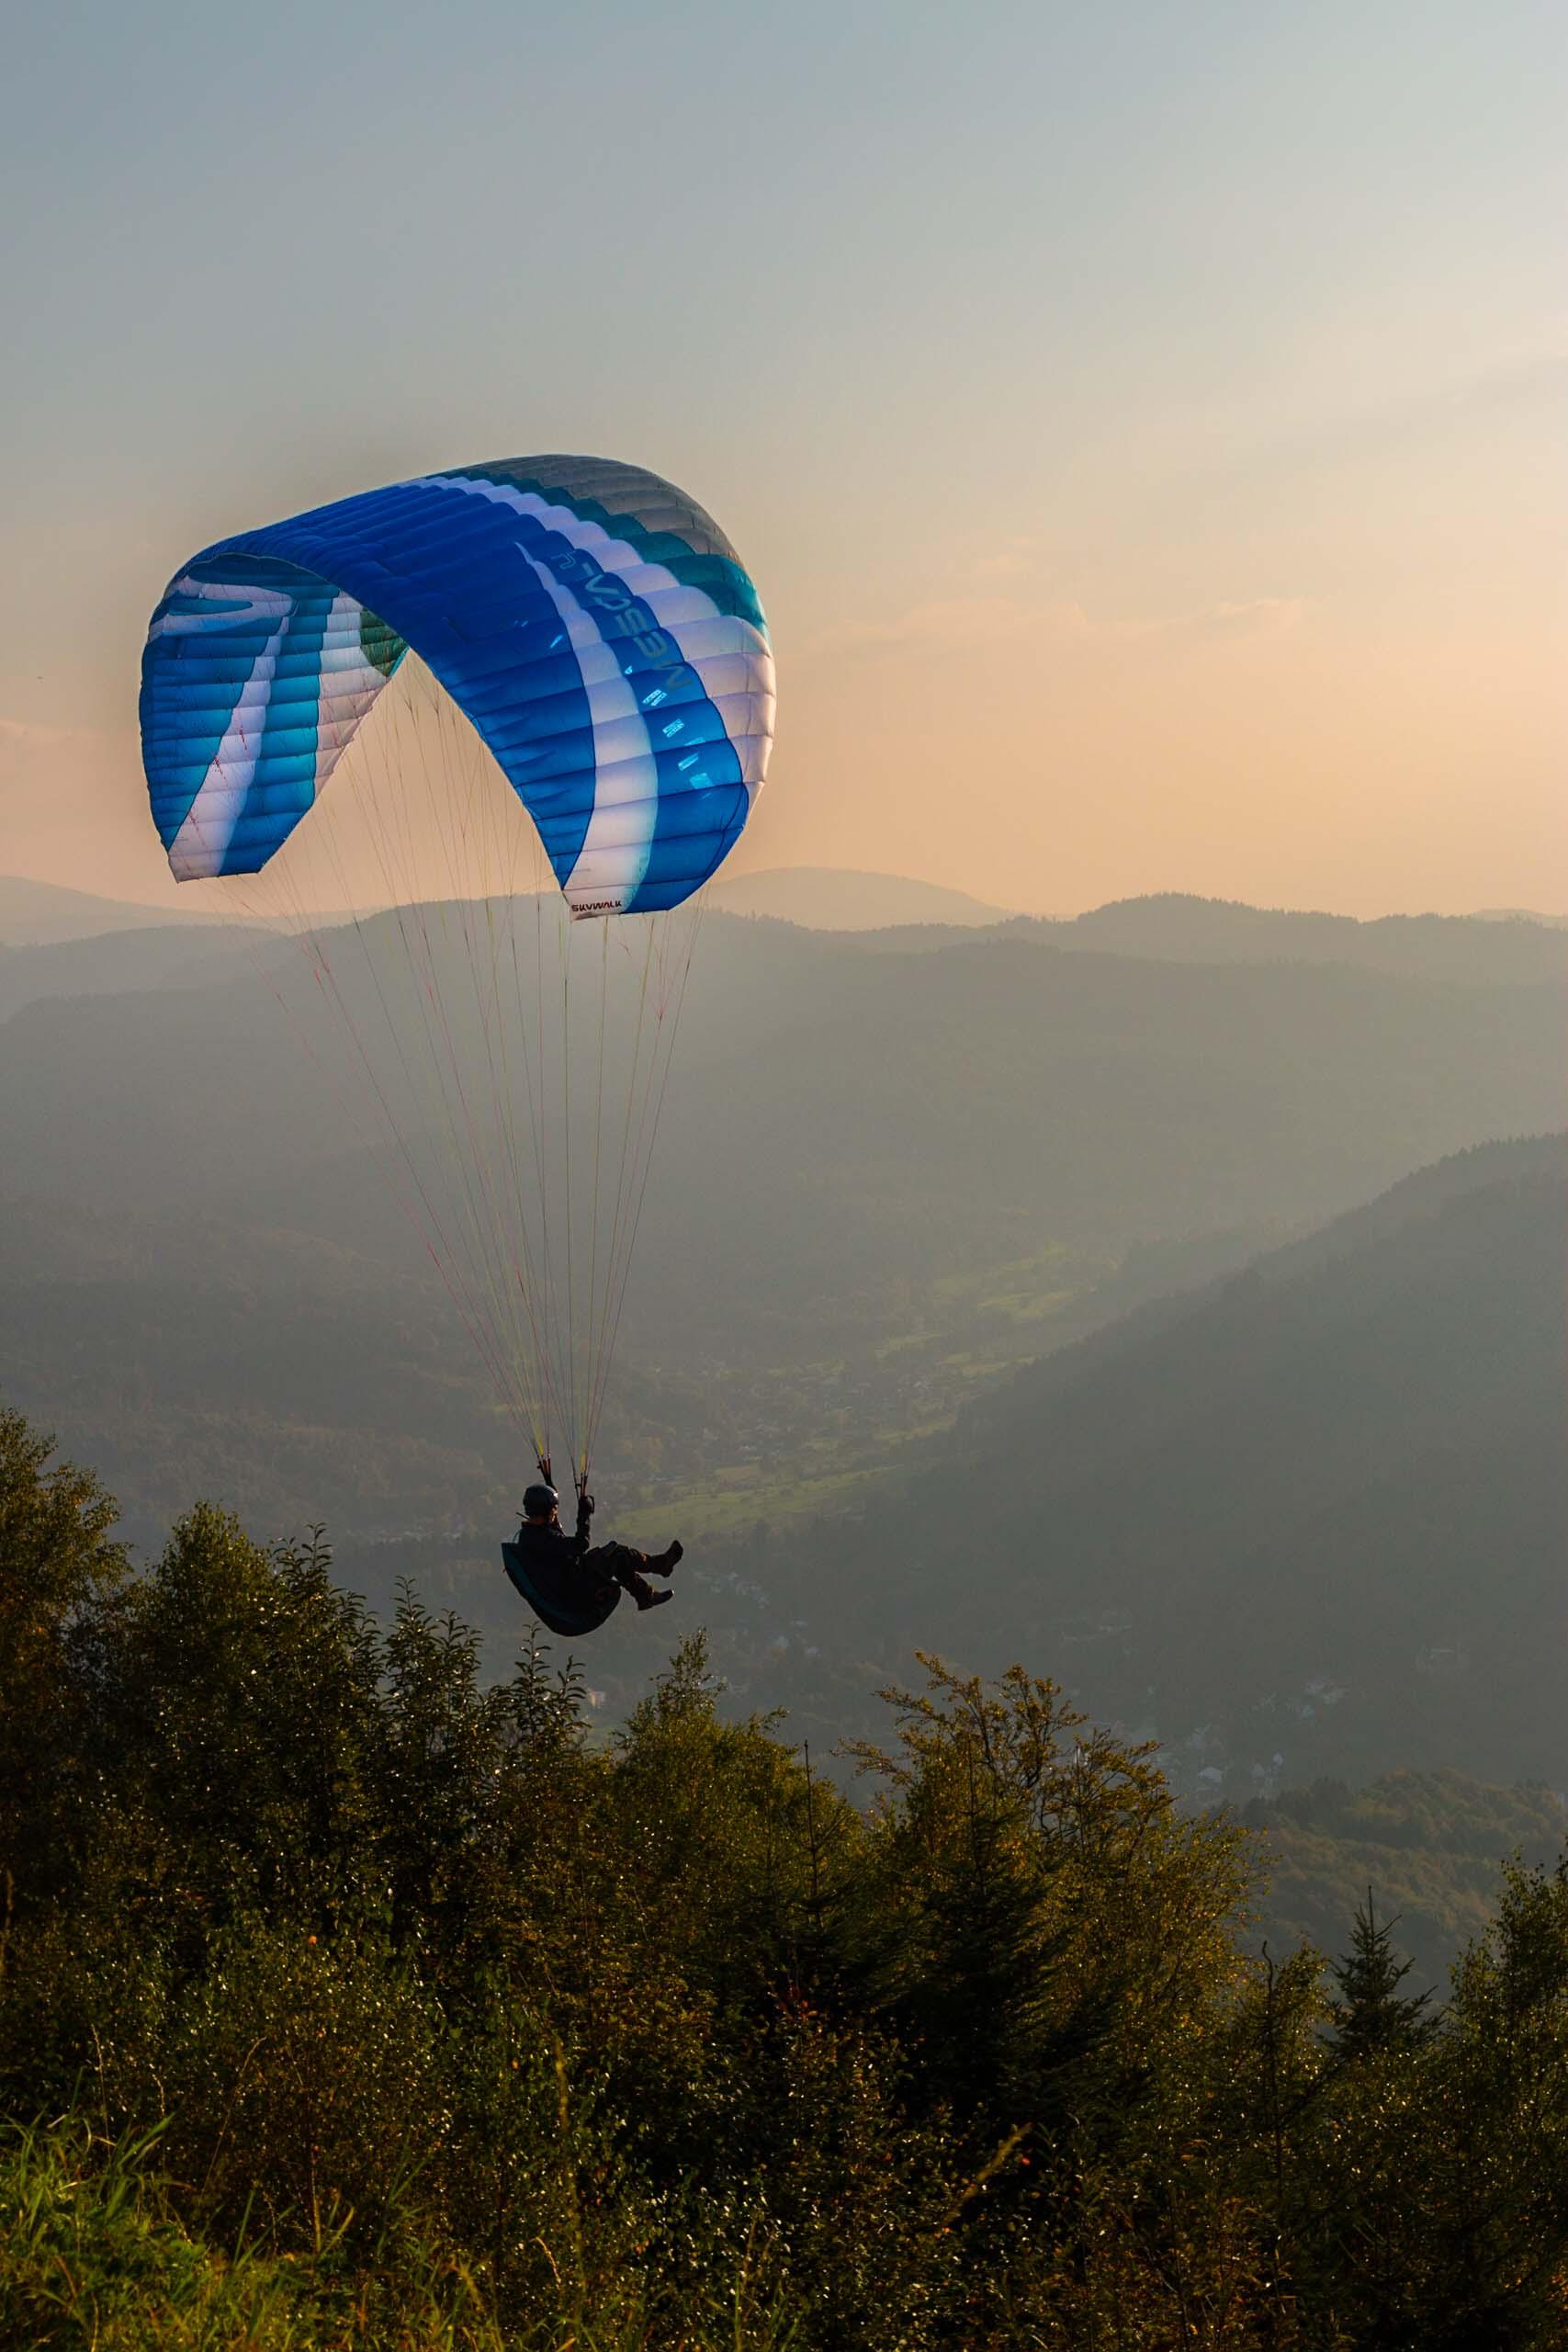 Merkur Mountain - Baden Baden, Germany - October 2014